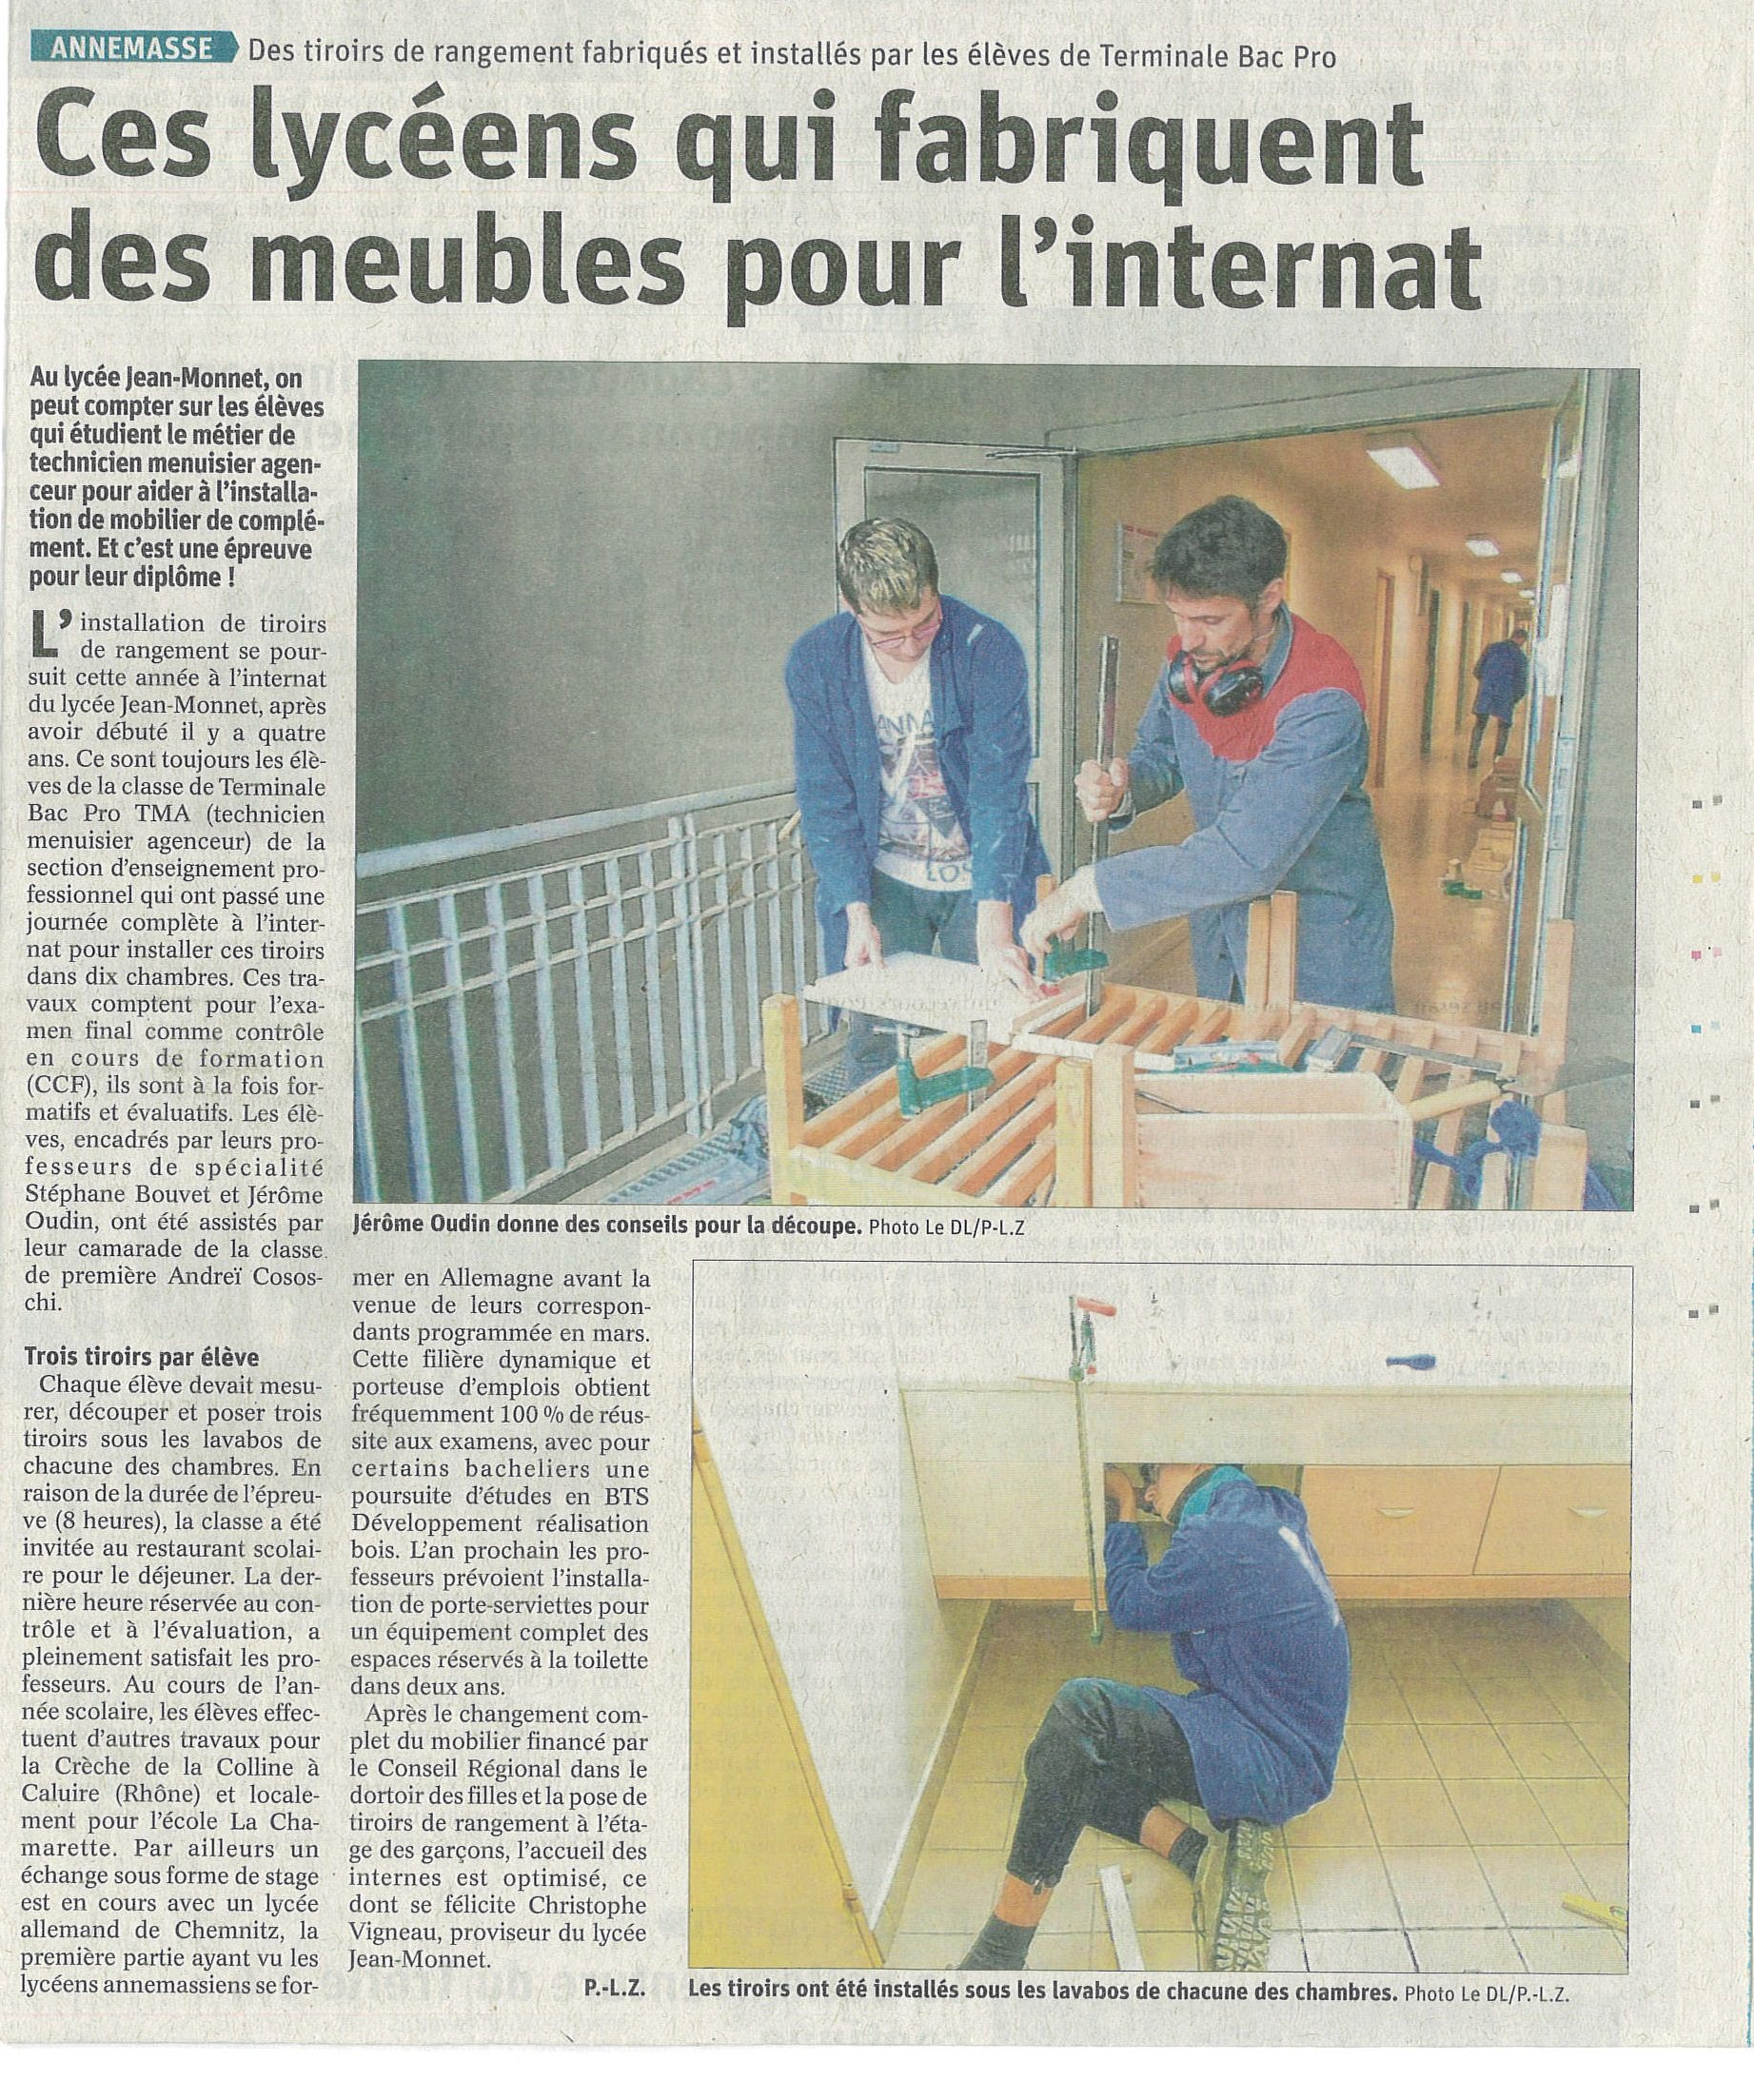 construction meubles dl 28-01-20.jpg